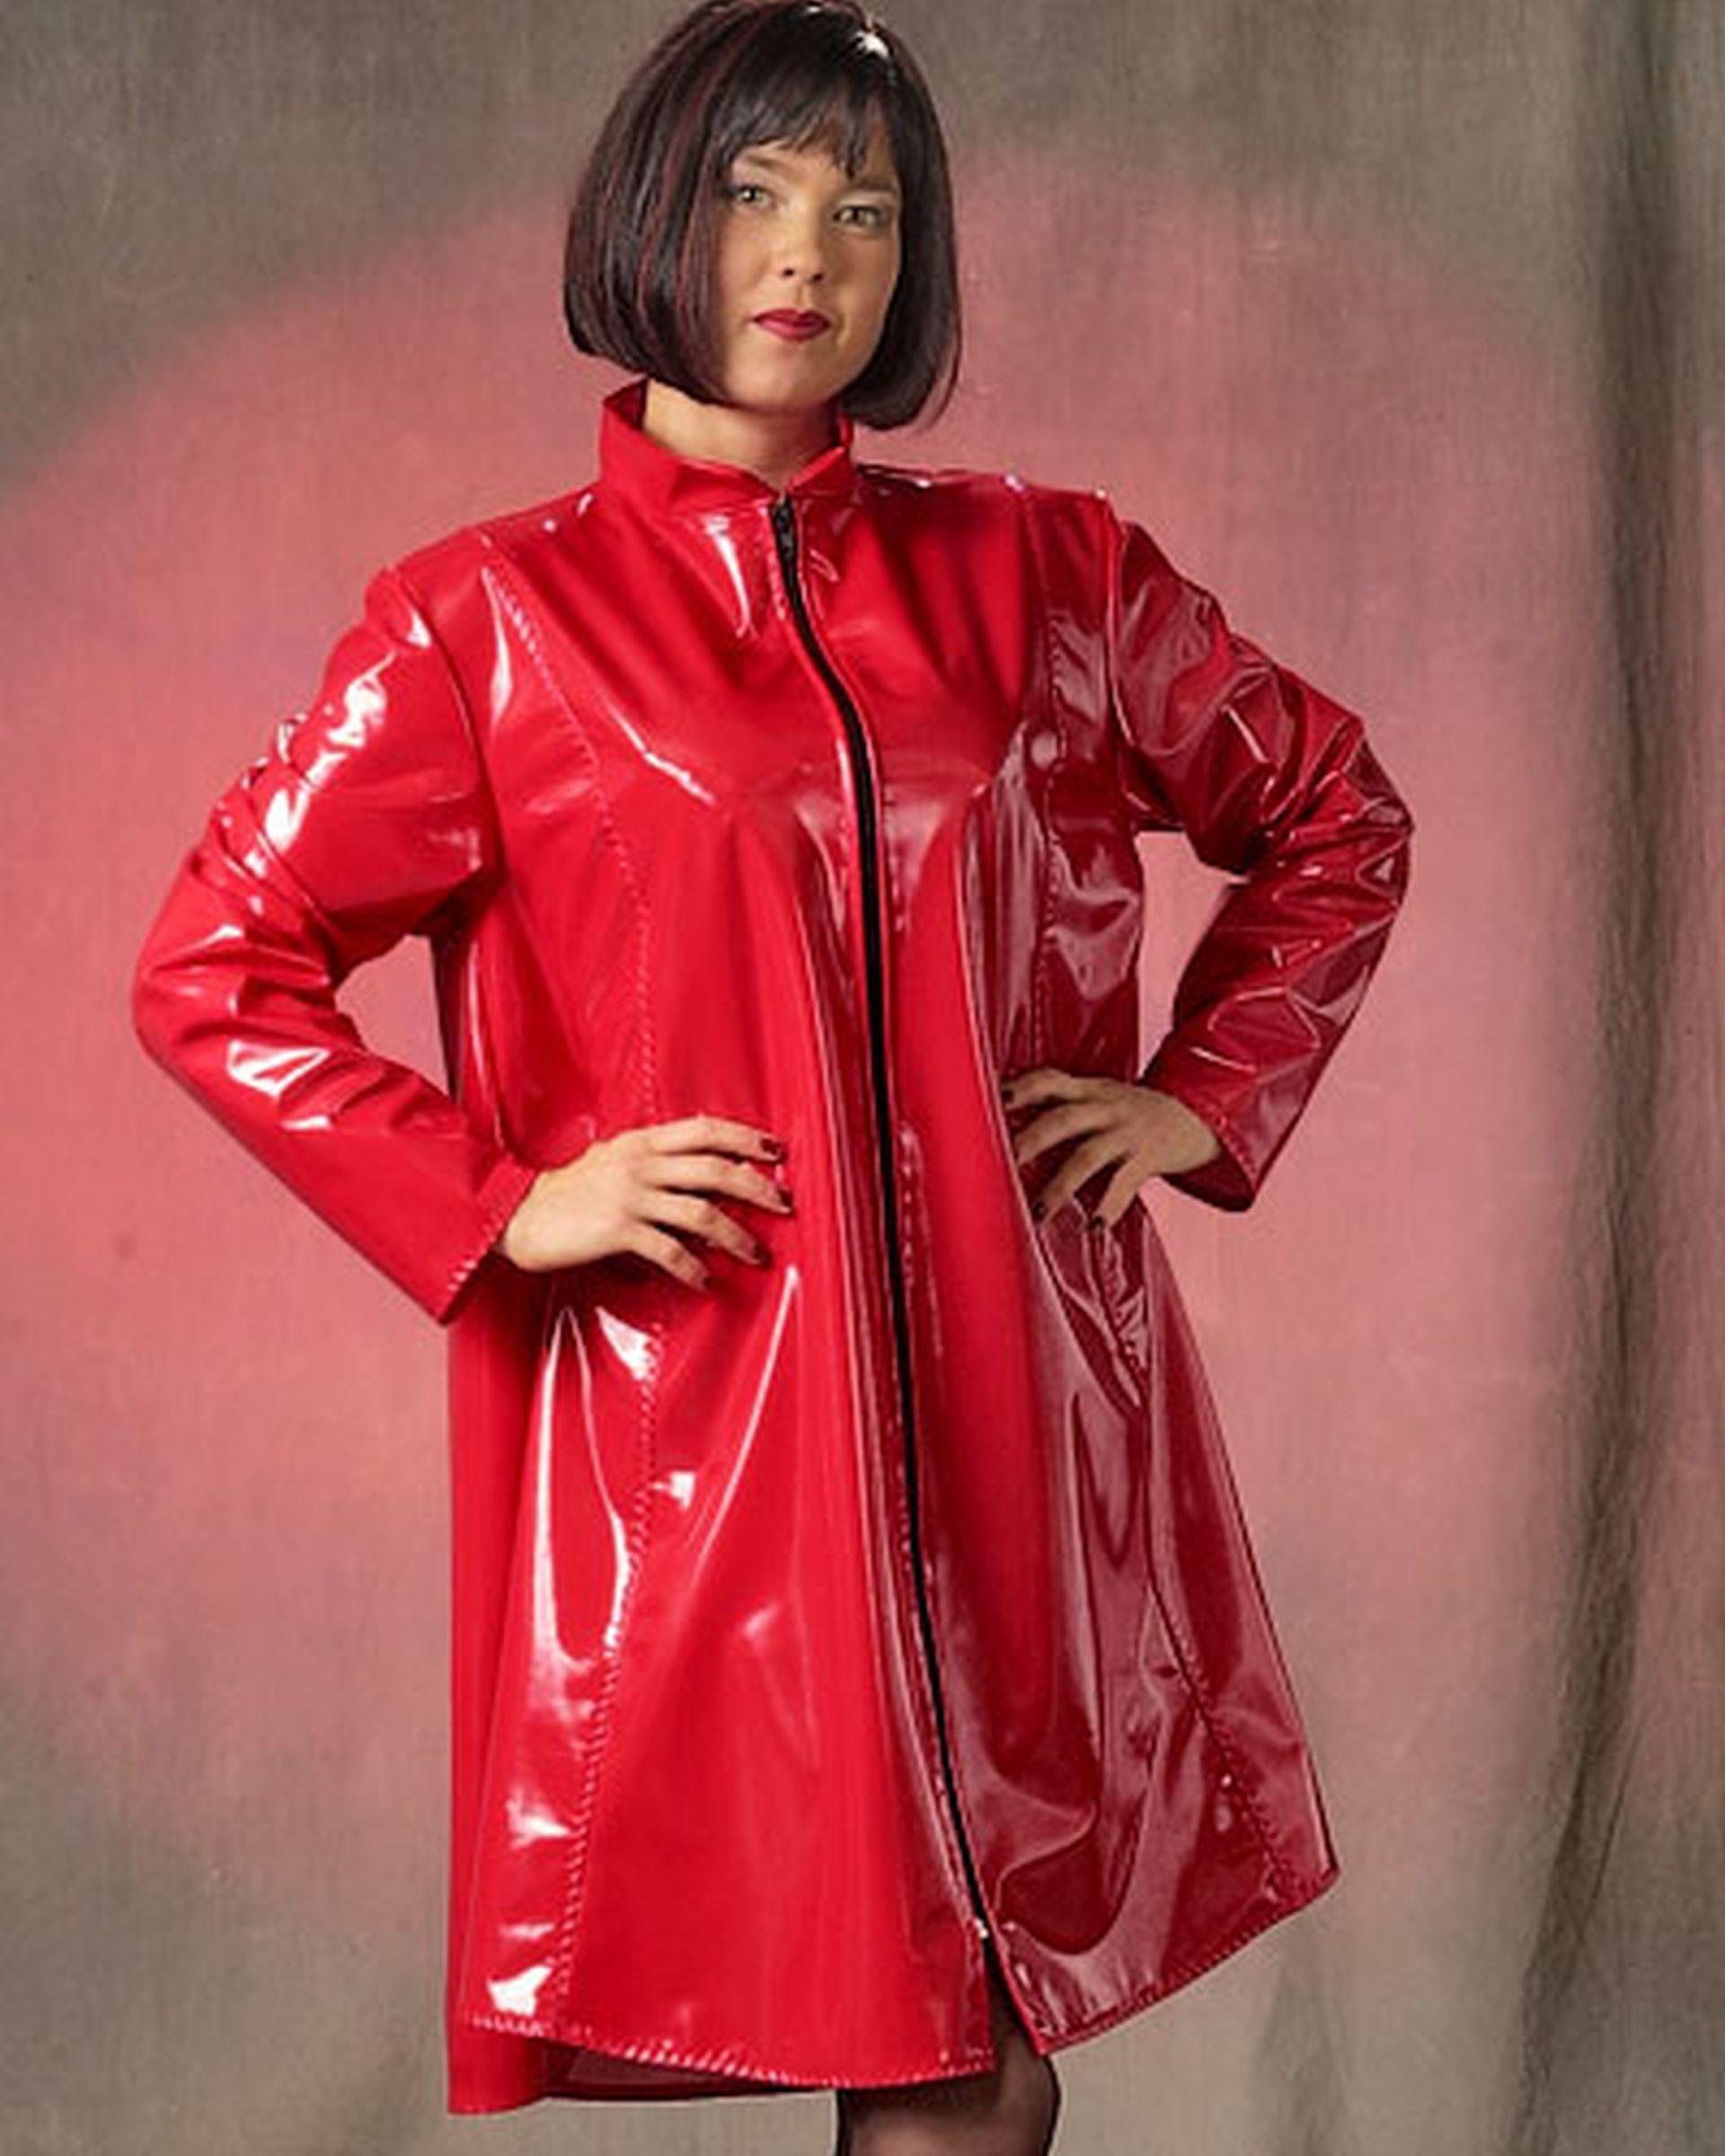 rainwear-handjob-movies-european-glamour-girl-dana